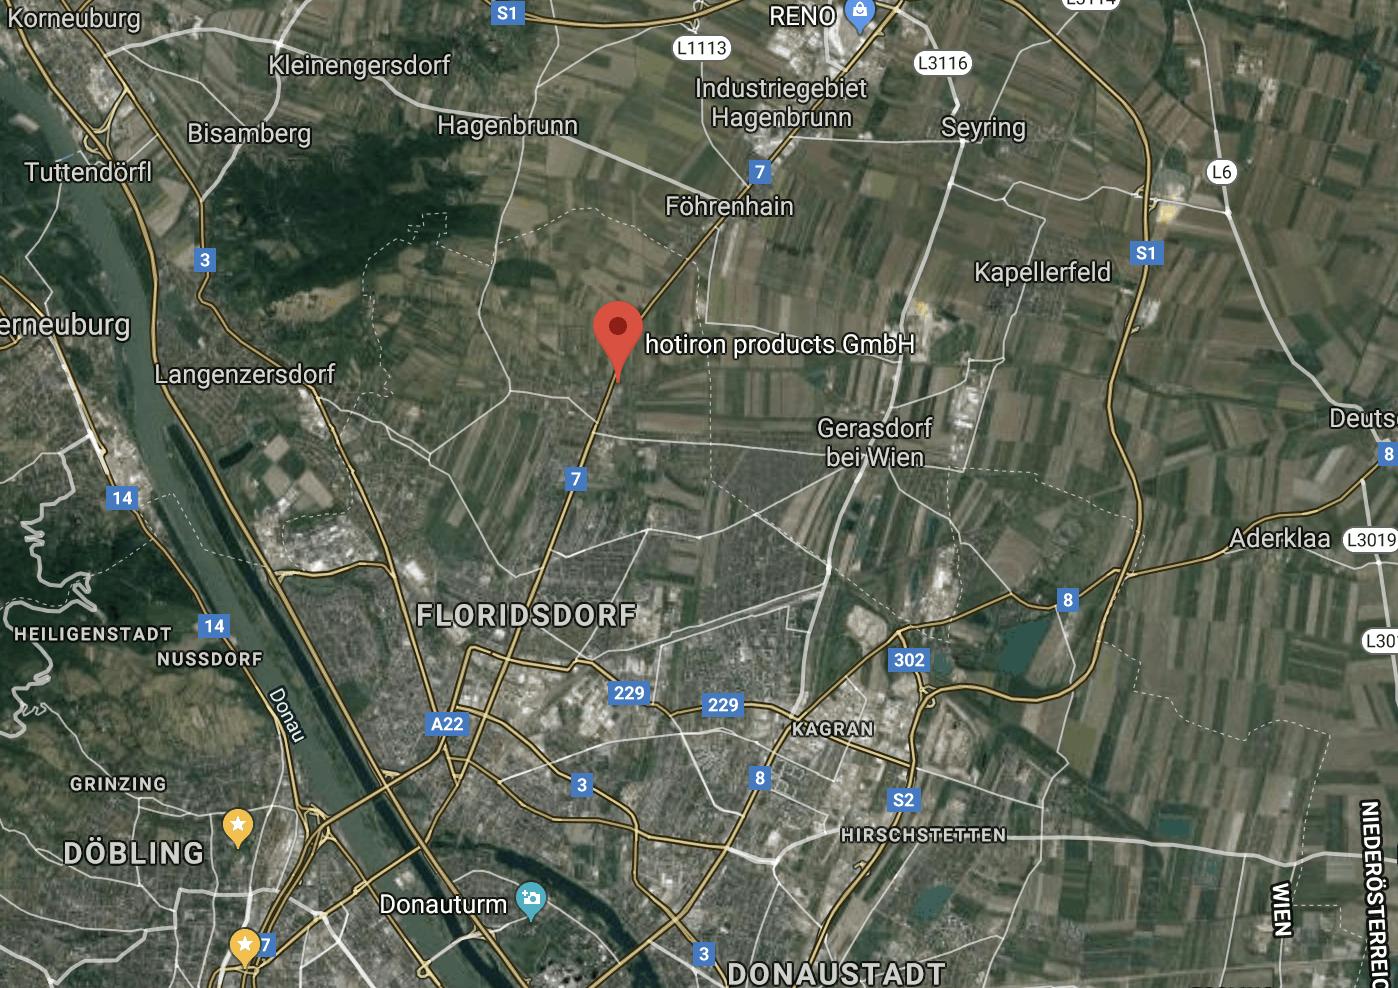 hotiron products GmbH on Google Maps